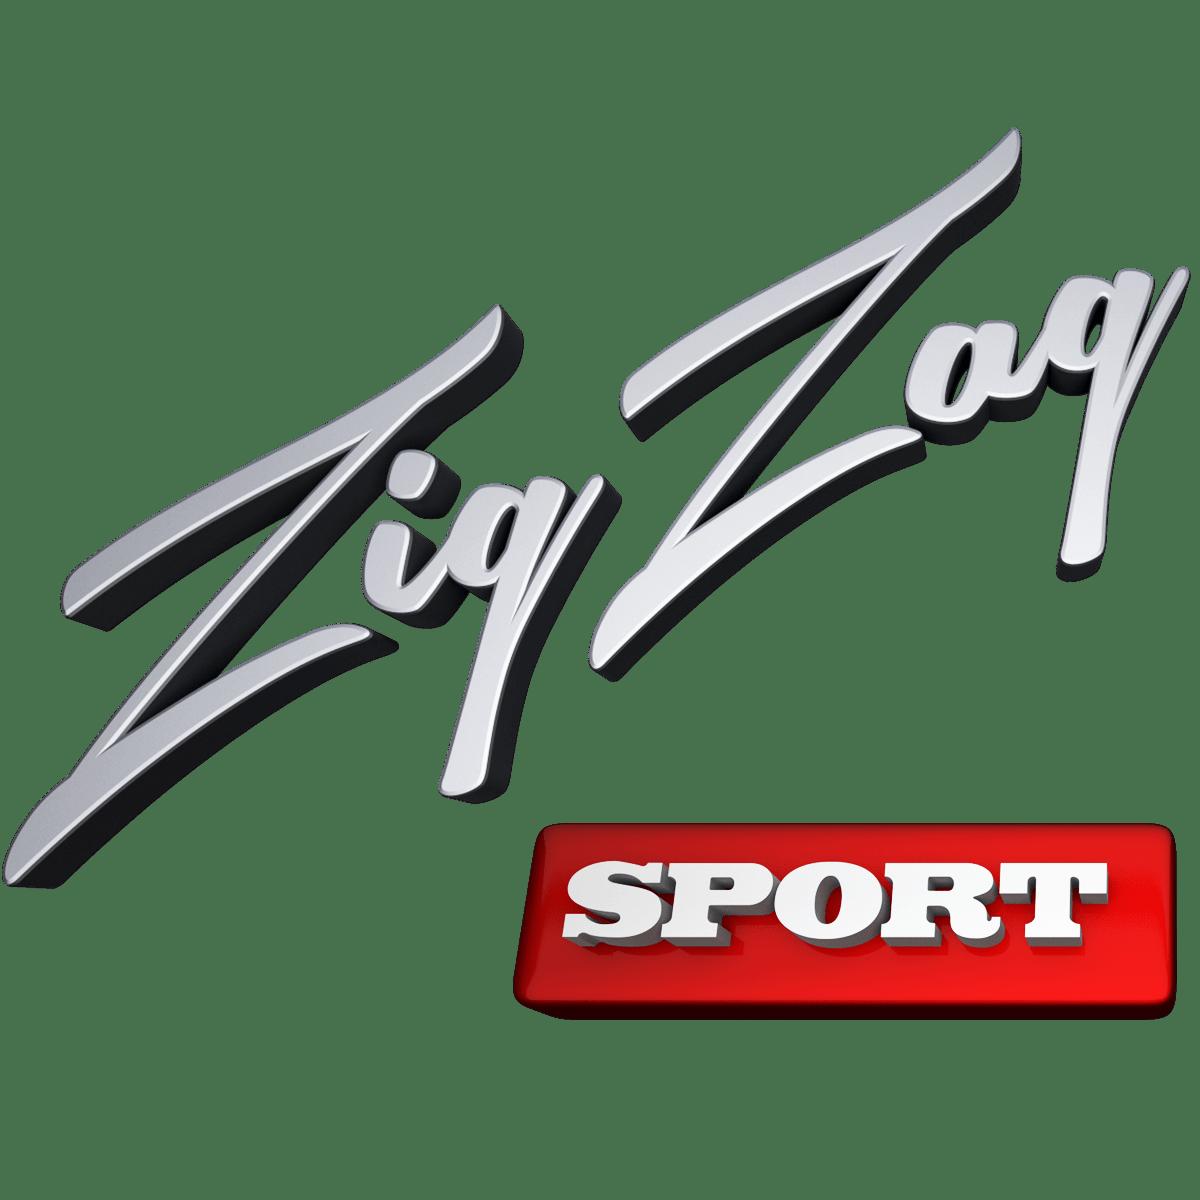 ZigZagSport